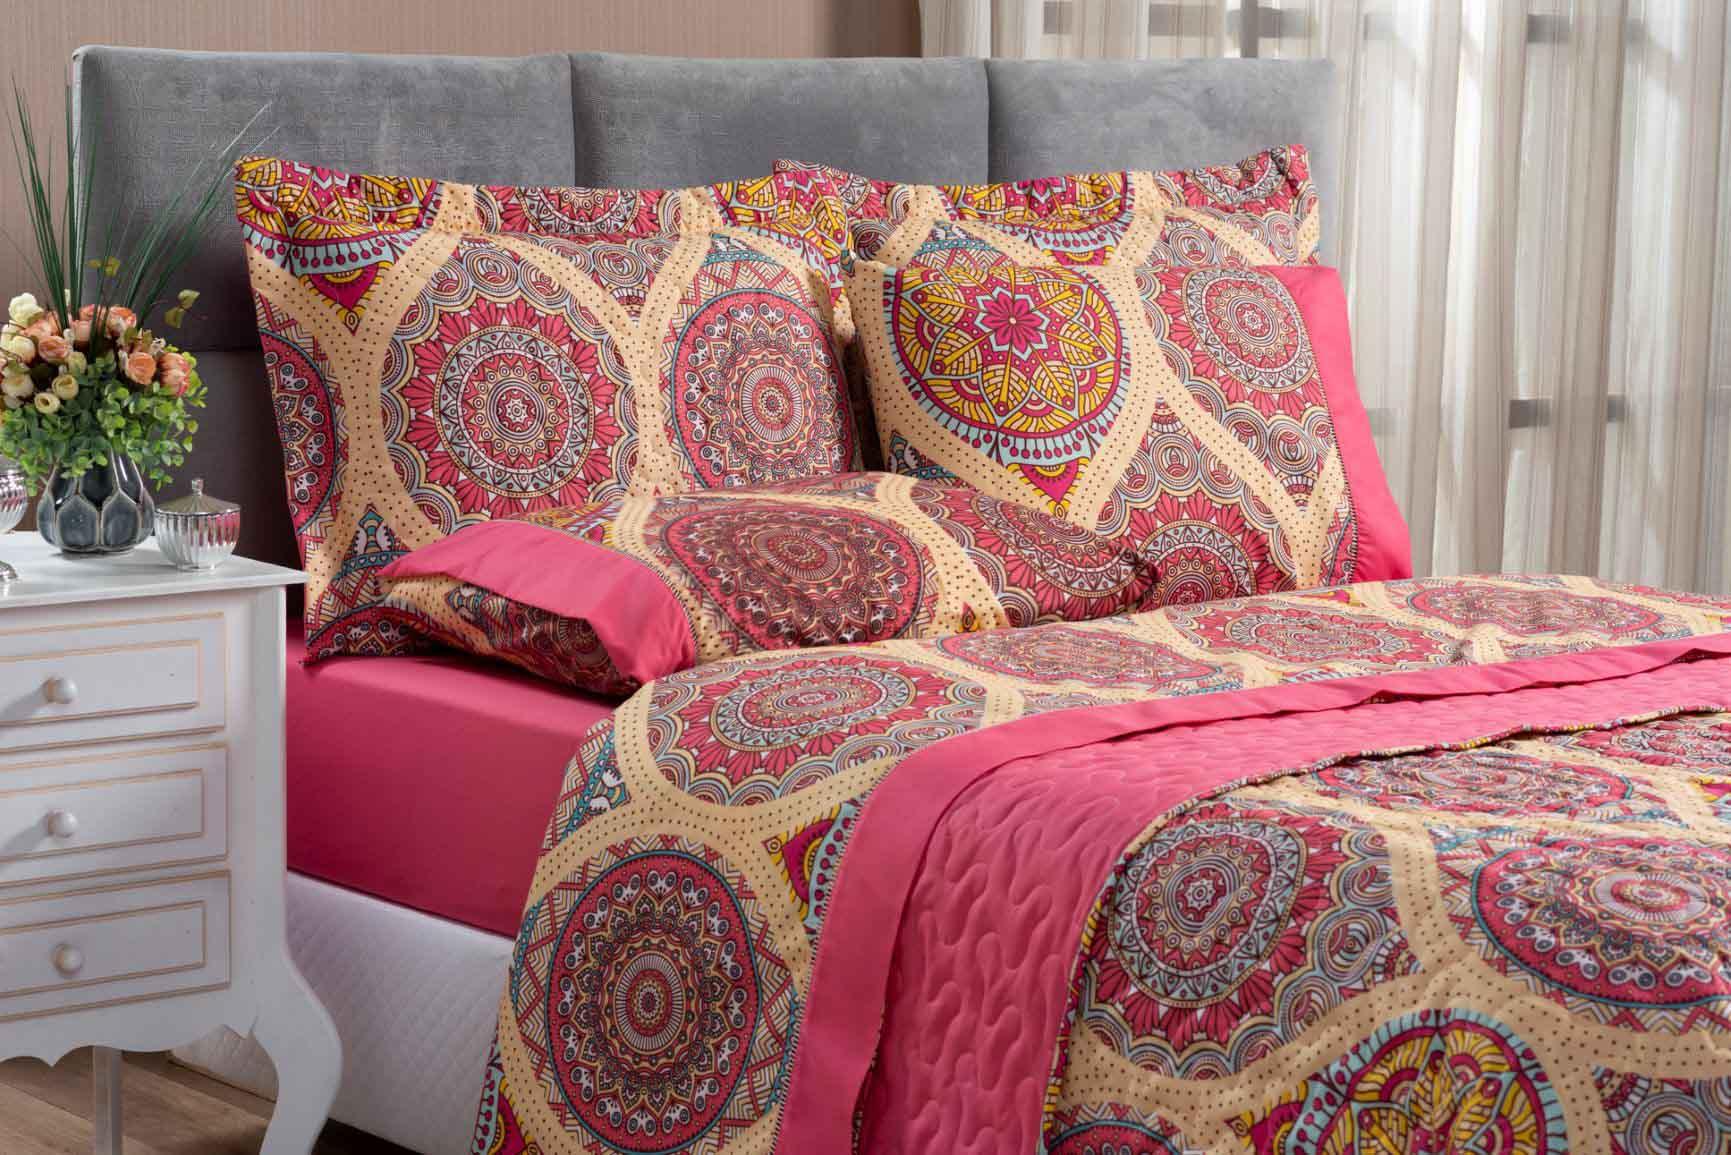 Kit Cobre Leito Colcha King 100% Costurada Dupla Face 3 Peças Naturale Mandala Rosa